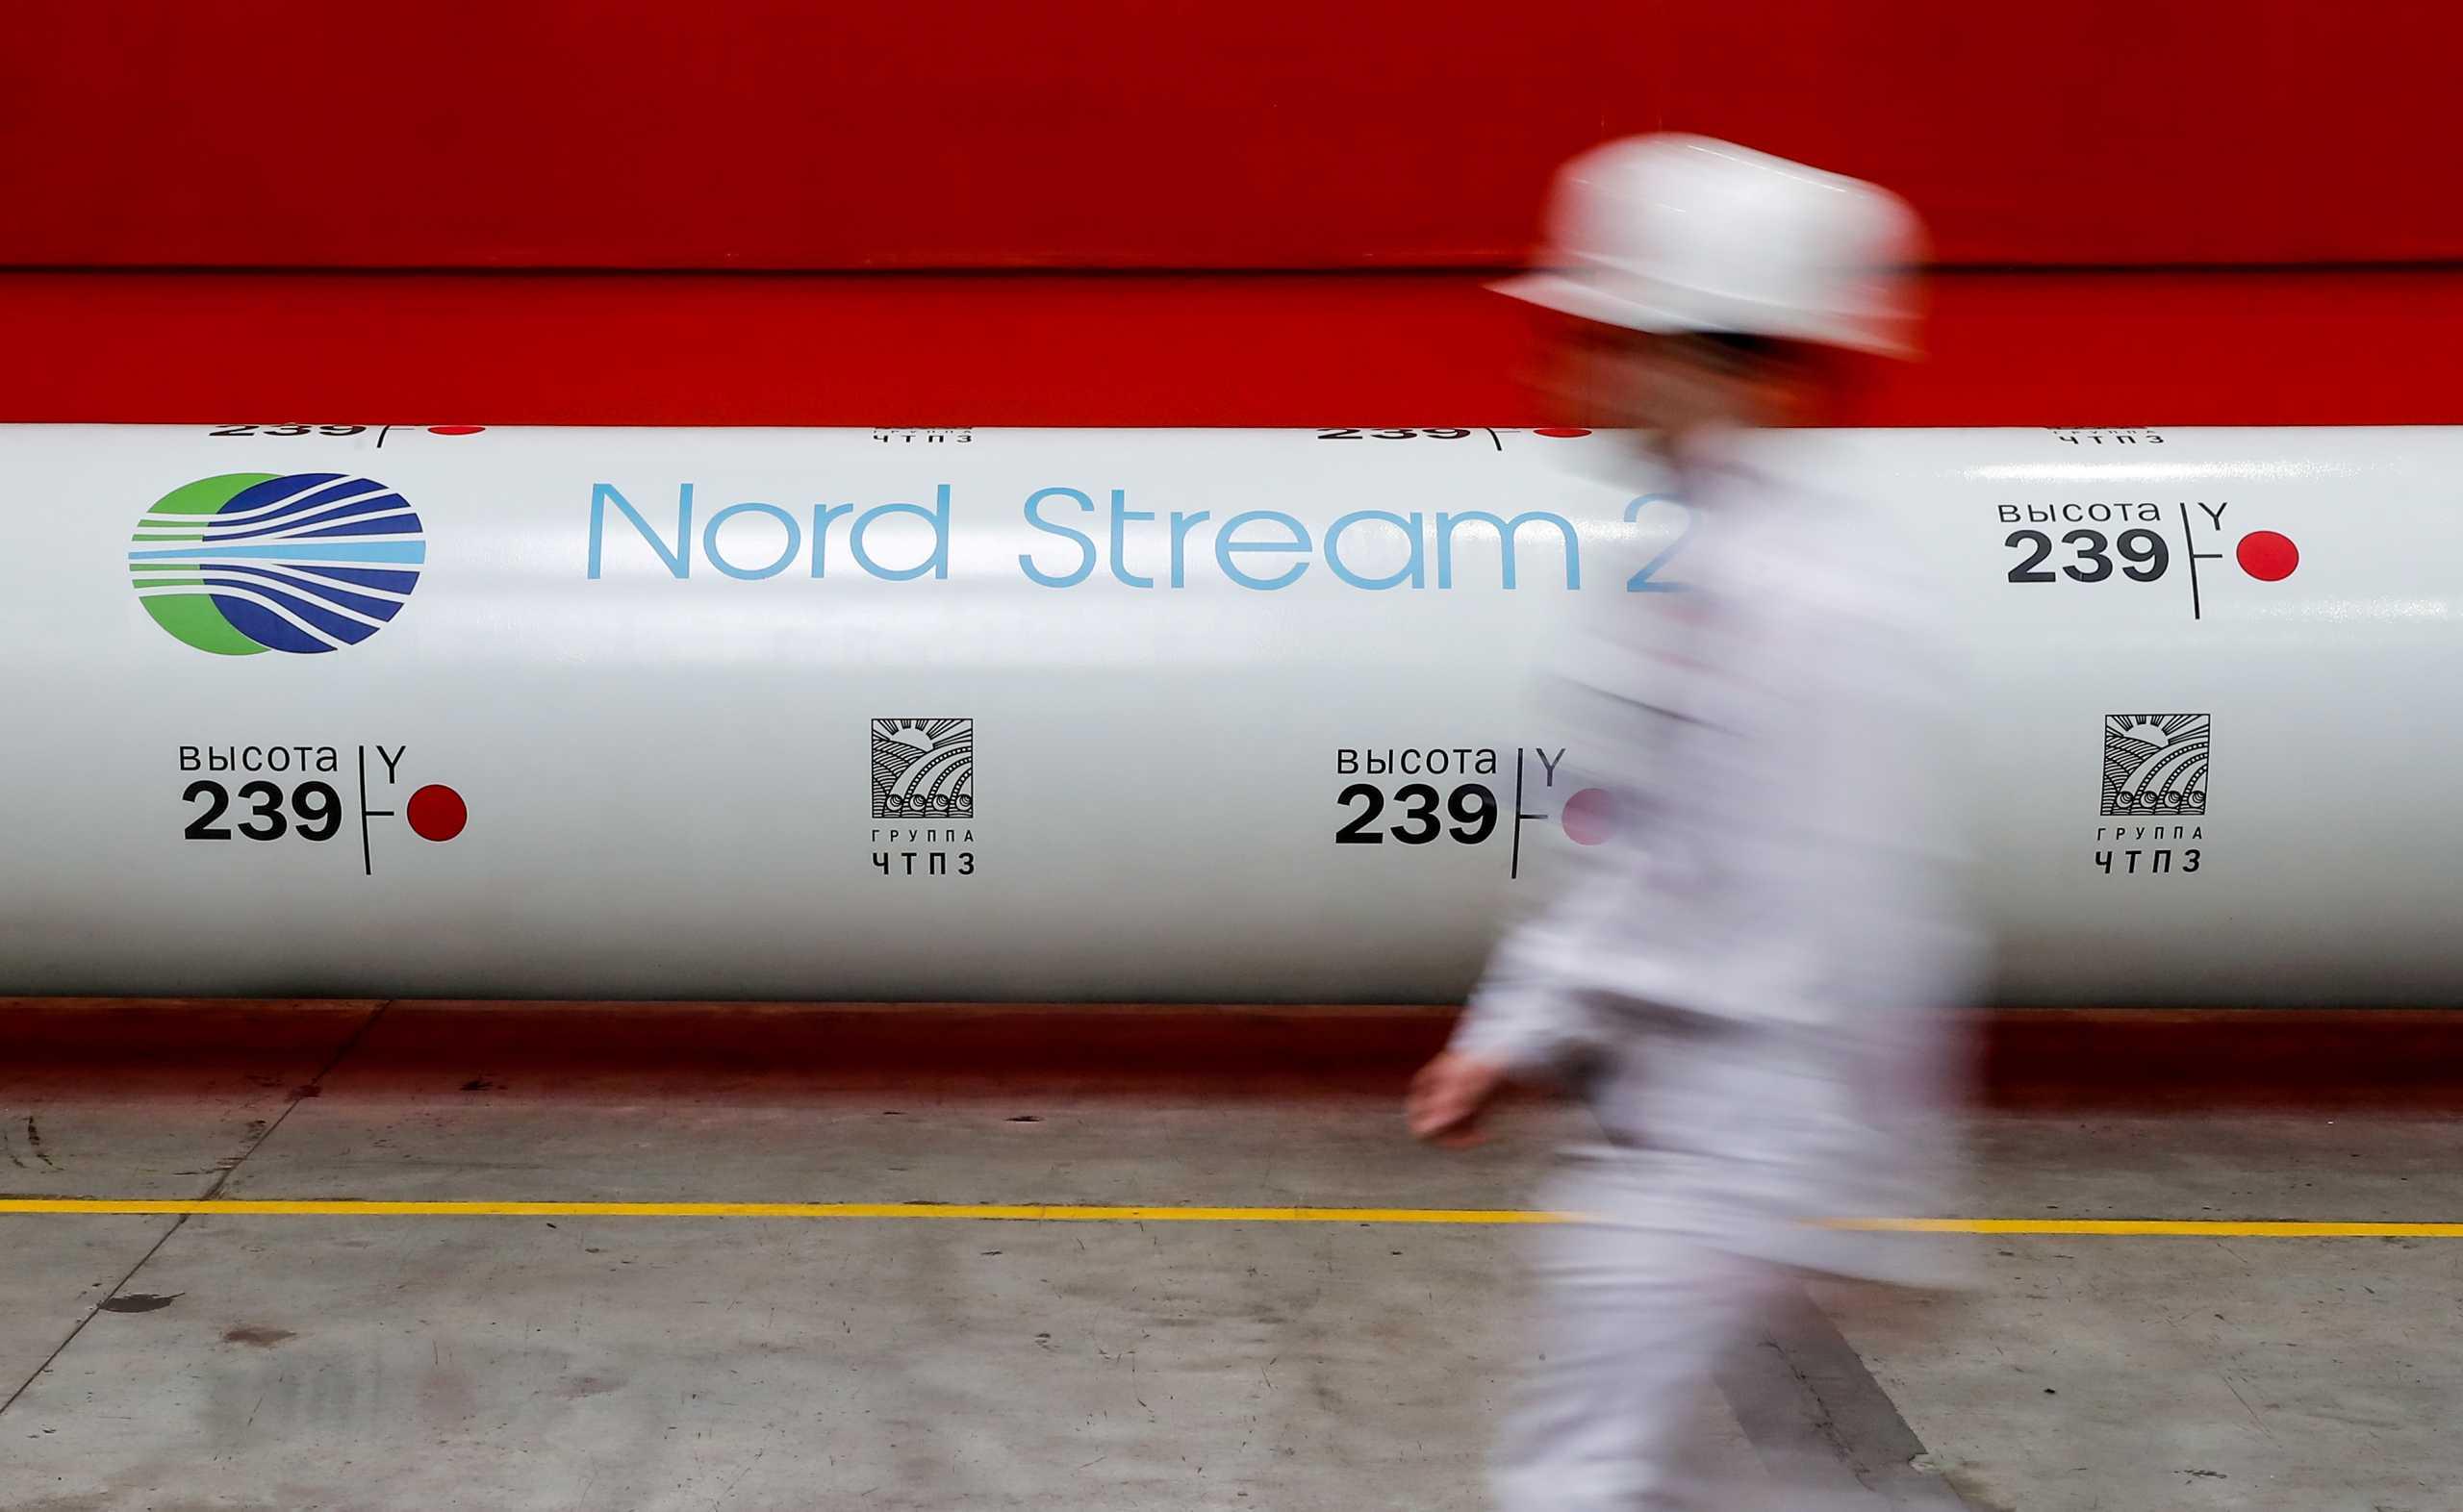 State Department: Οι ευρωπαϊκές εταιρείες αποσύρονται από το έργο του αγωγού Nord Stream -2